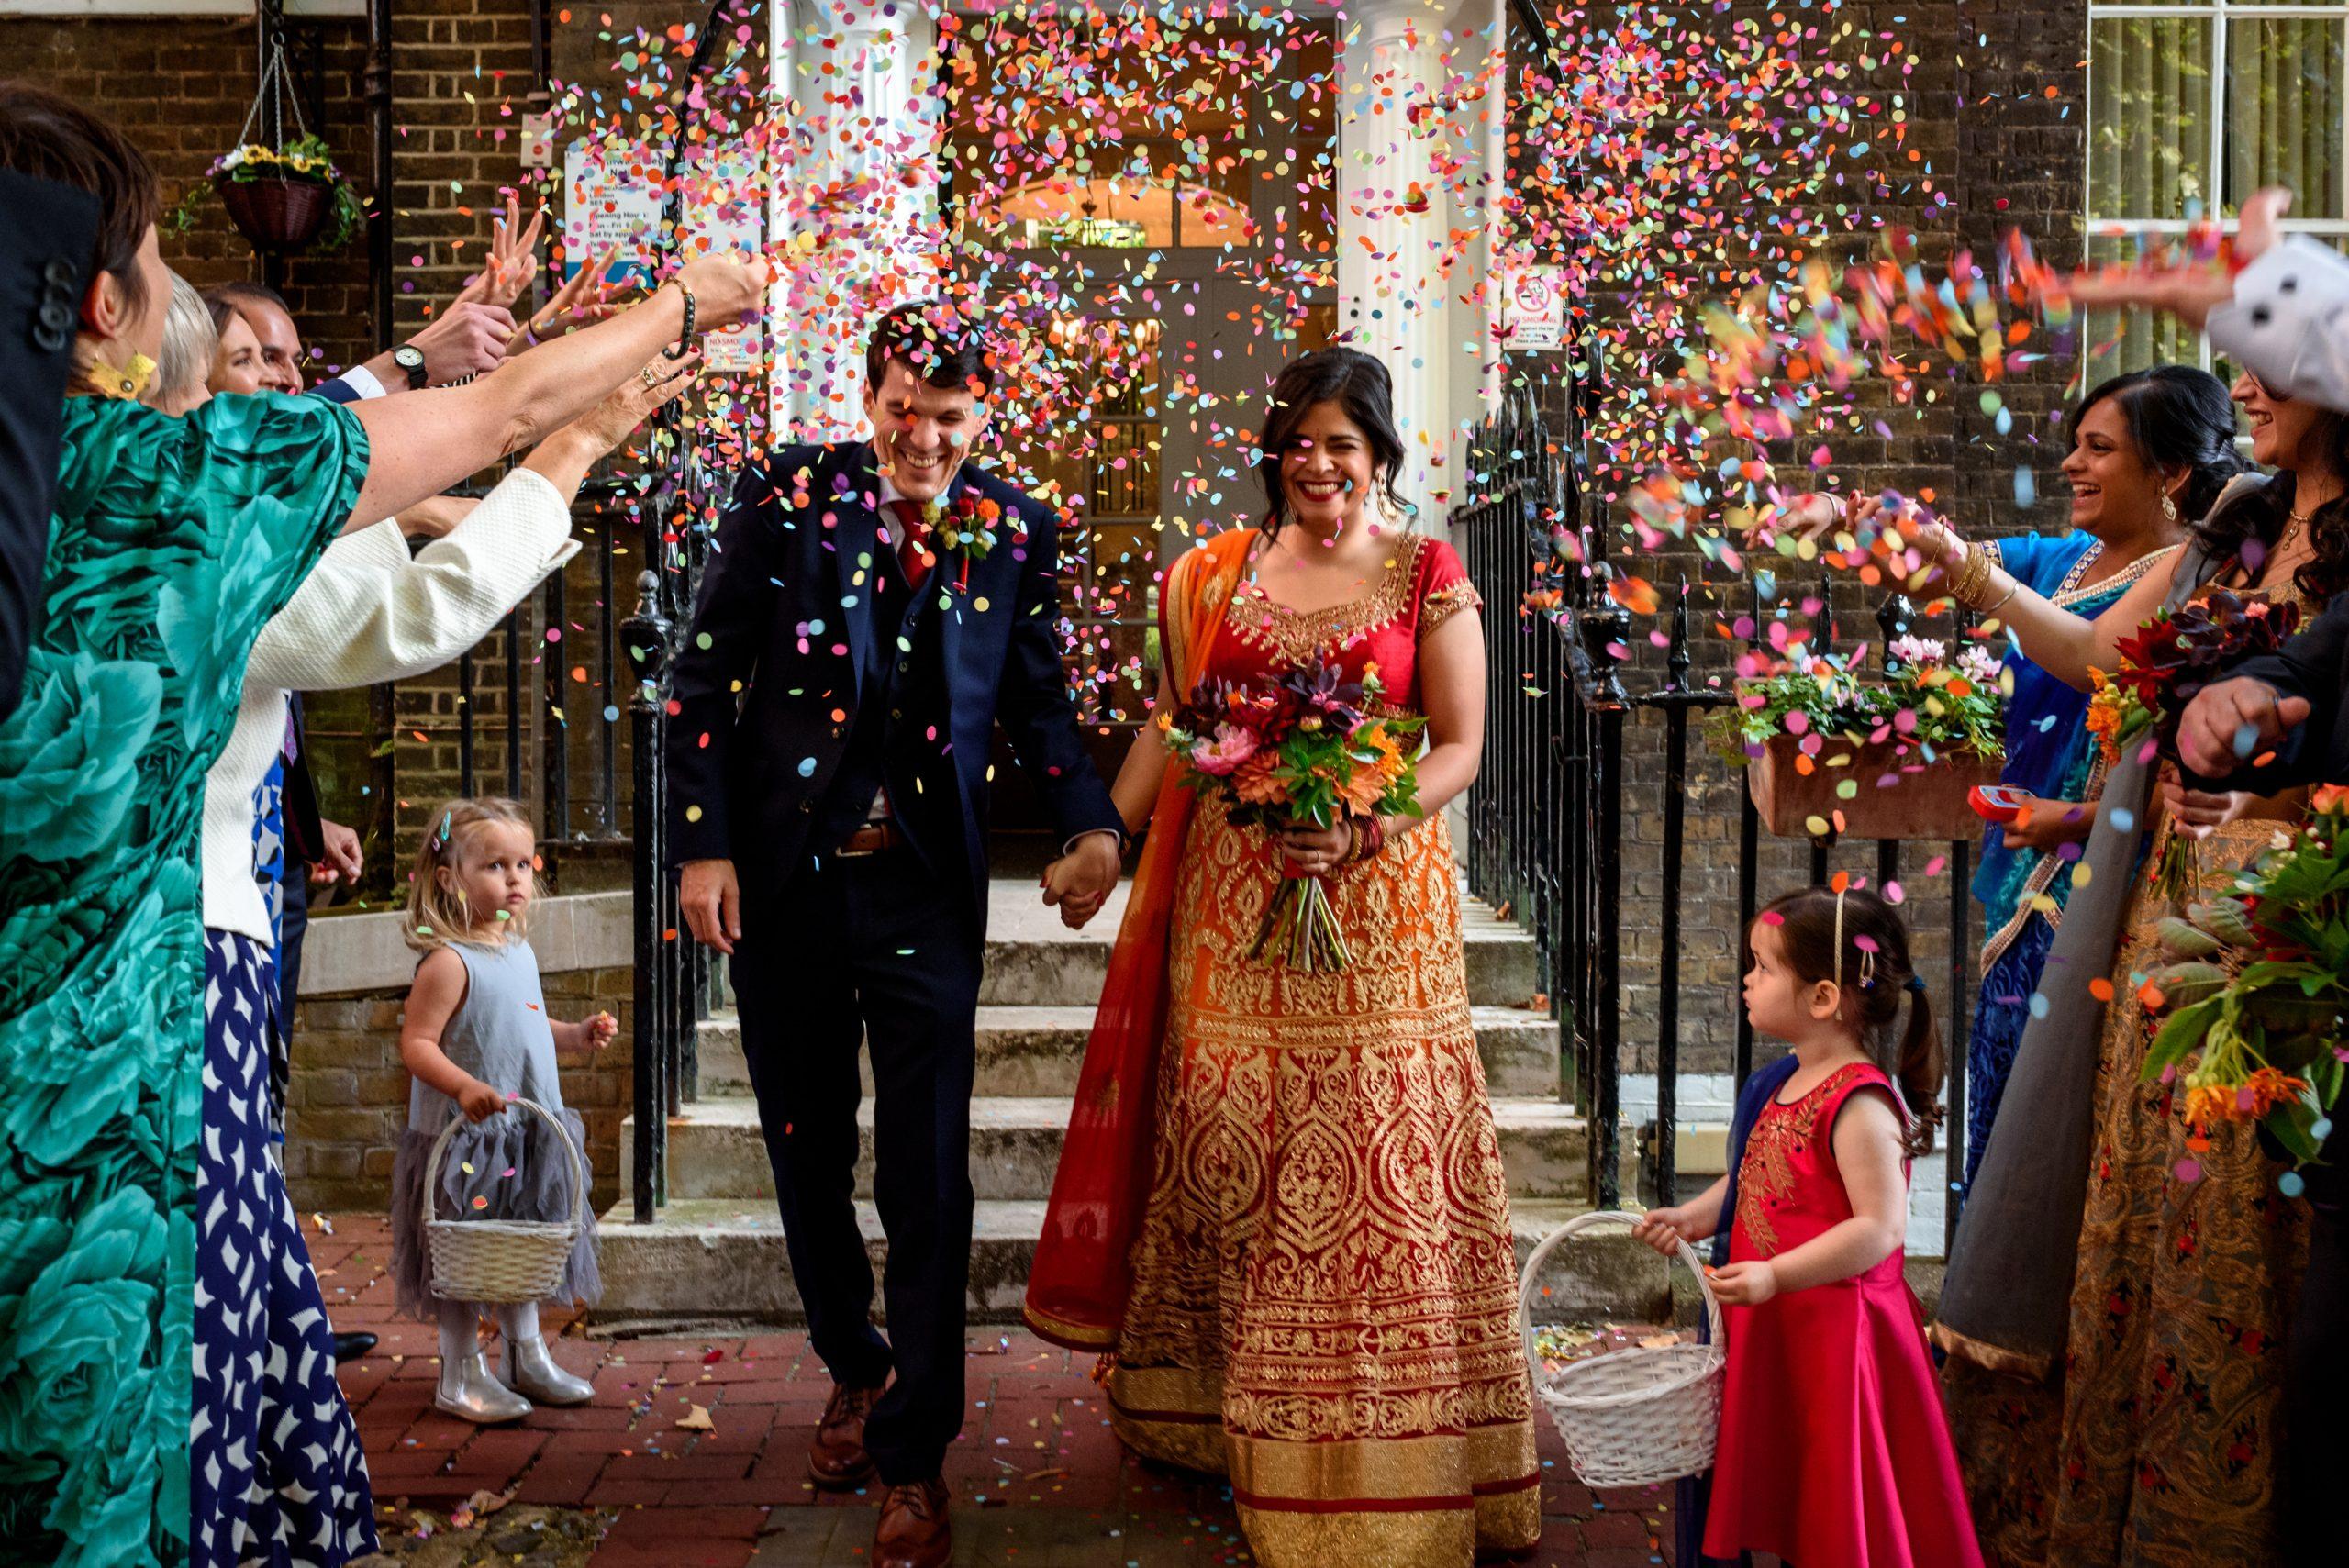 wedding confetti in front of Southwark Registry Office